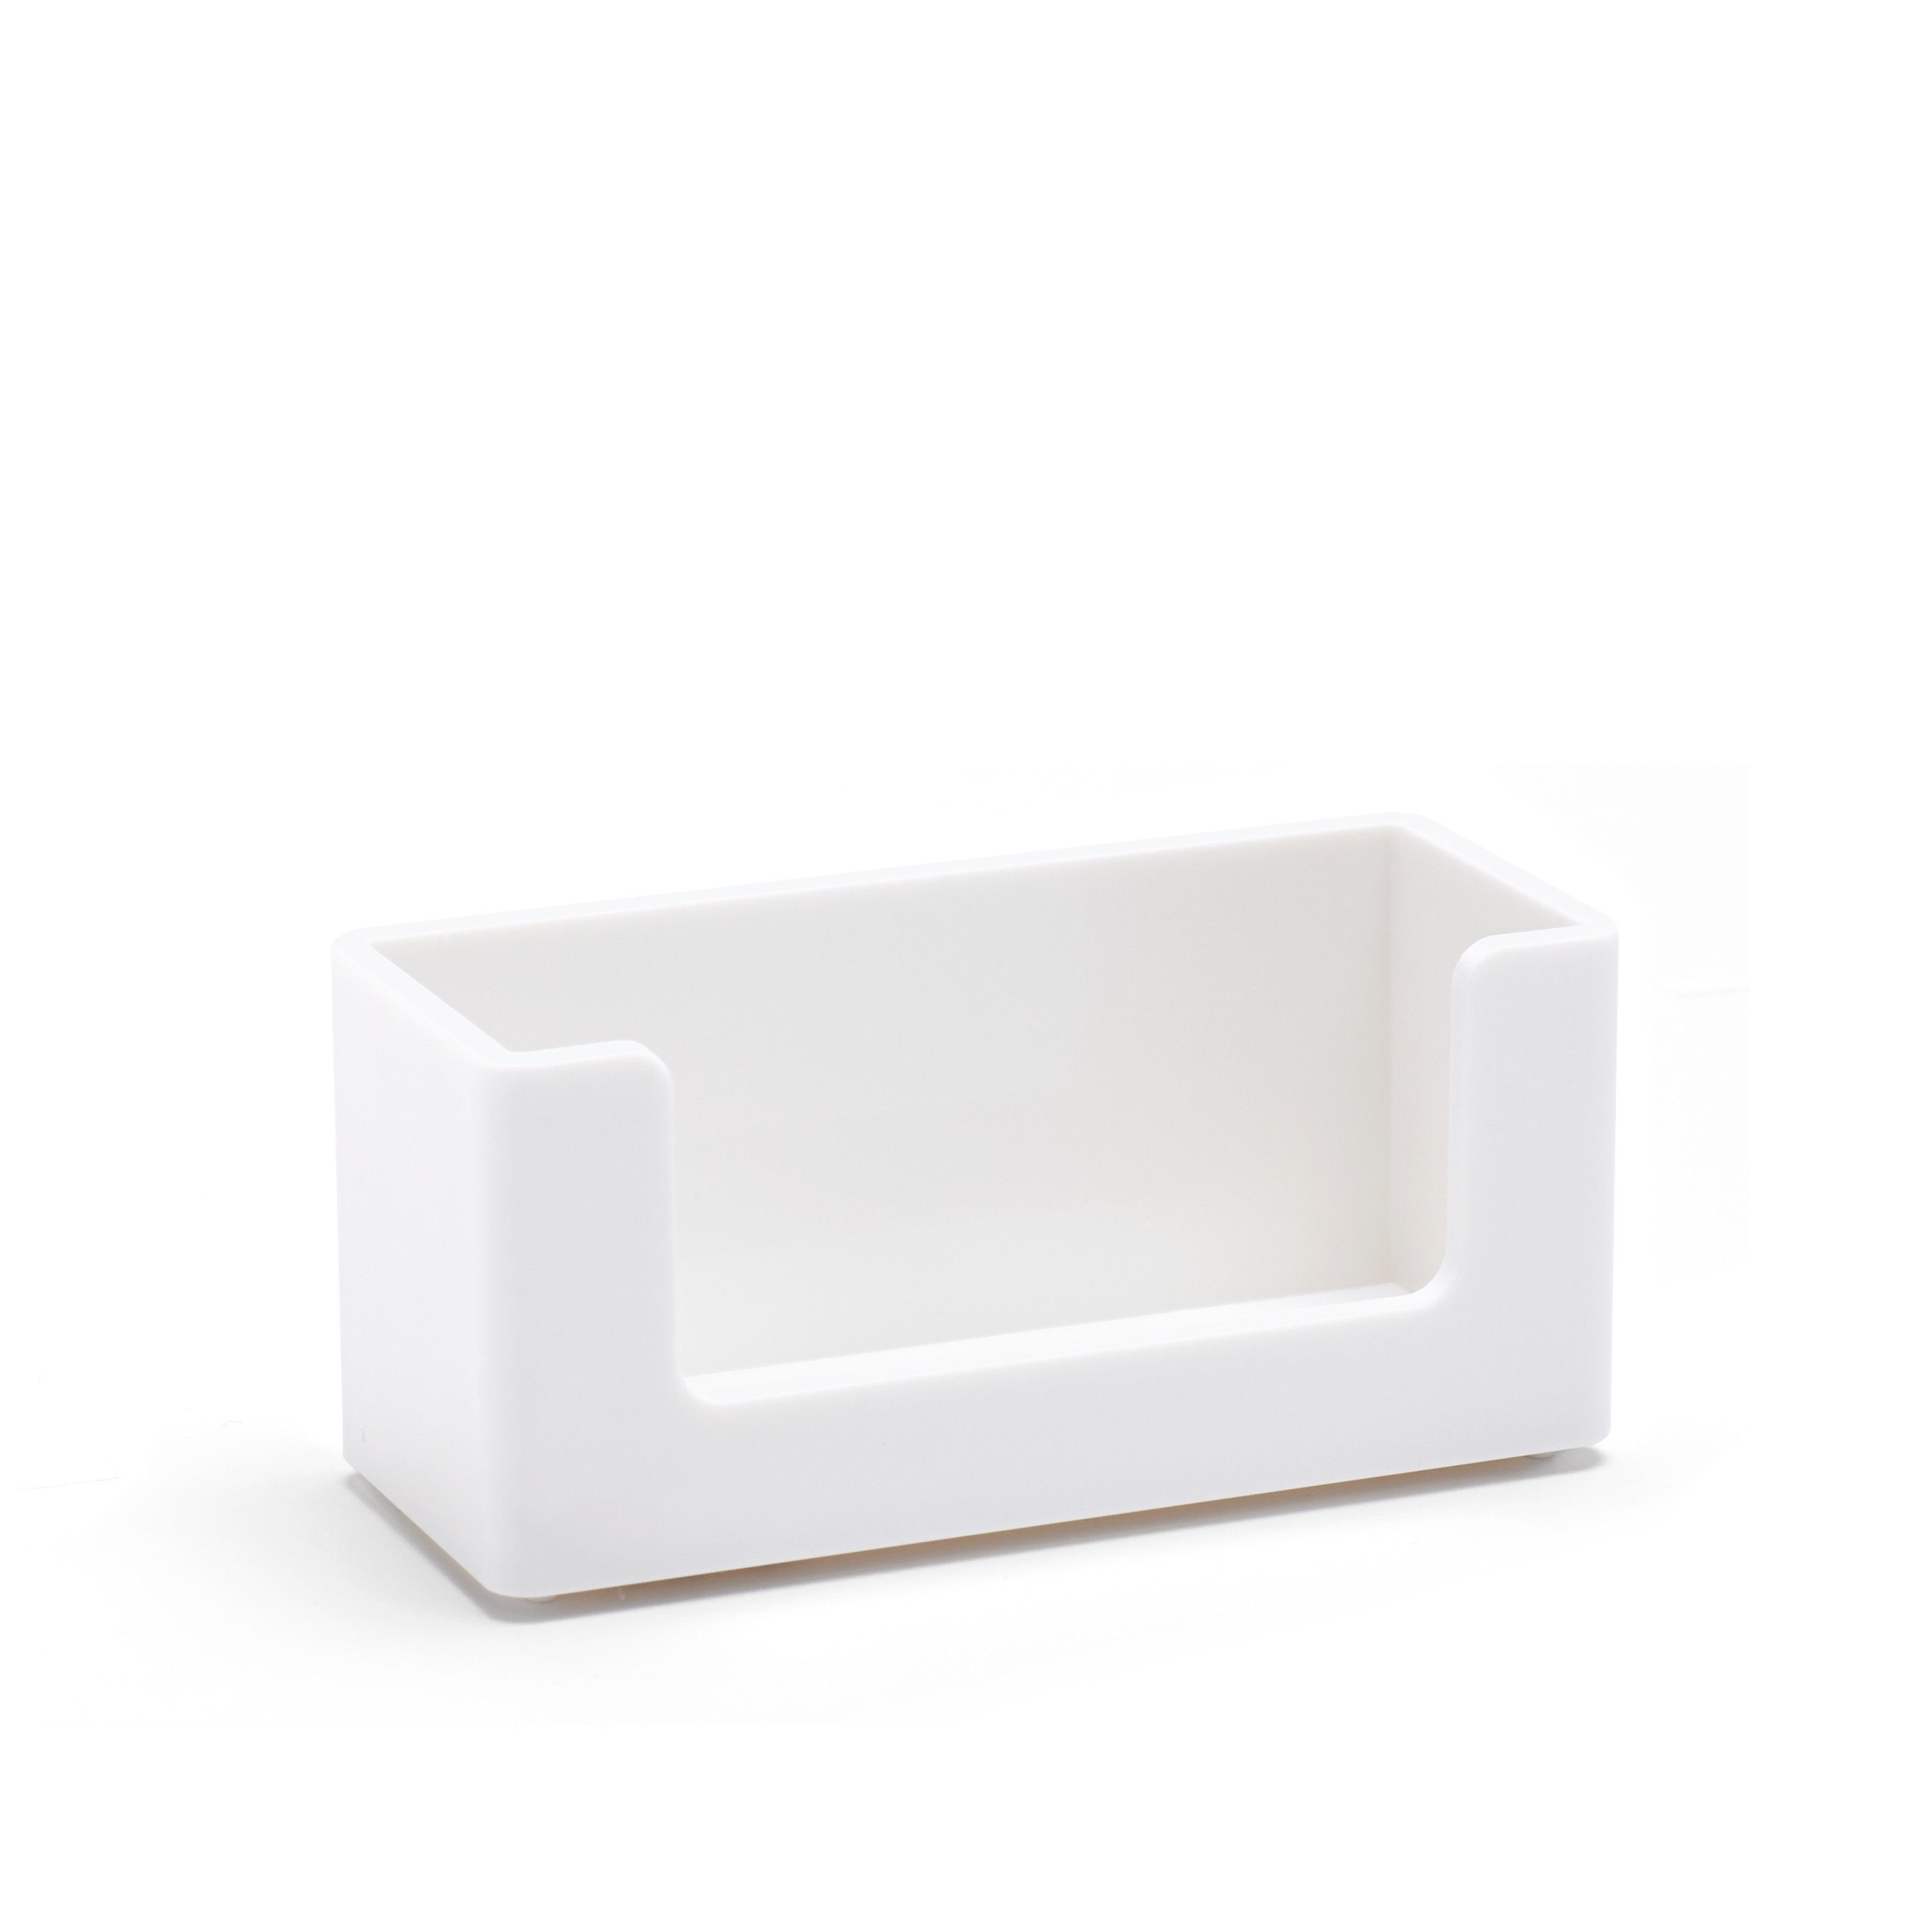 White Business Card Holder Desk Accessories Organization Poppin Business Card Holders White Business Card Card Holder Desk